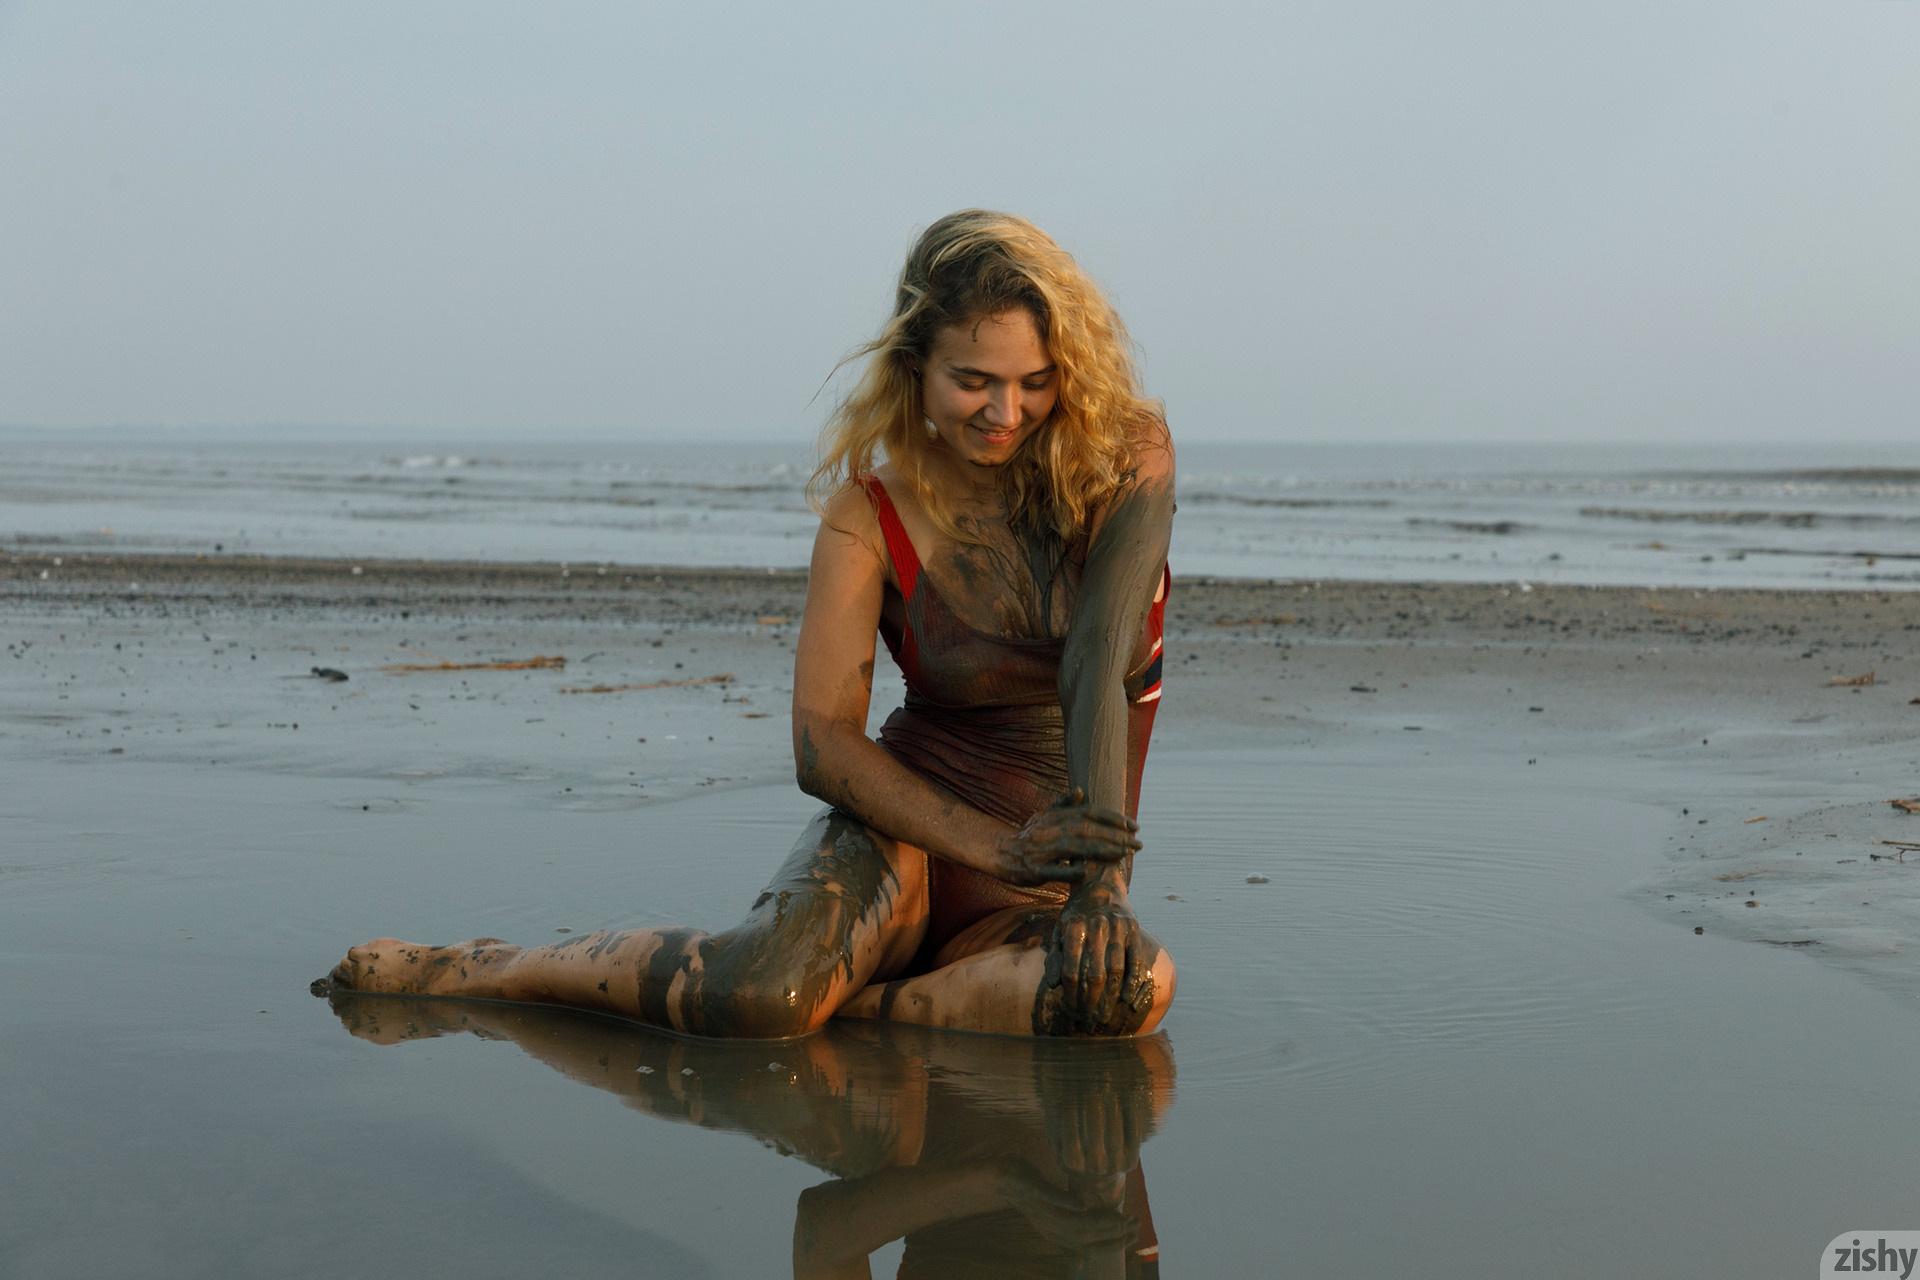 Sofia Orlova On Gryaznyy Beach Zishy (33)